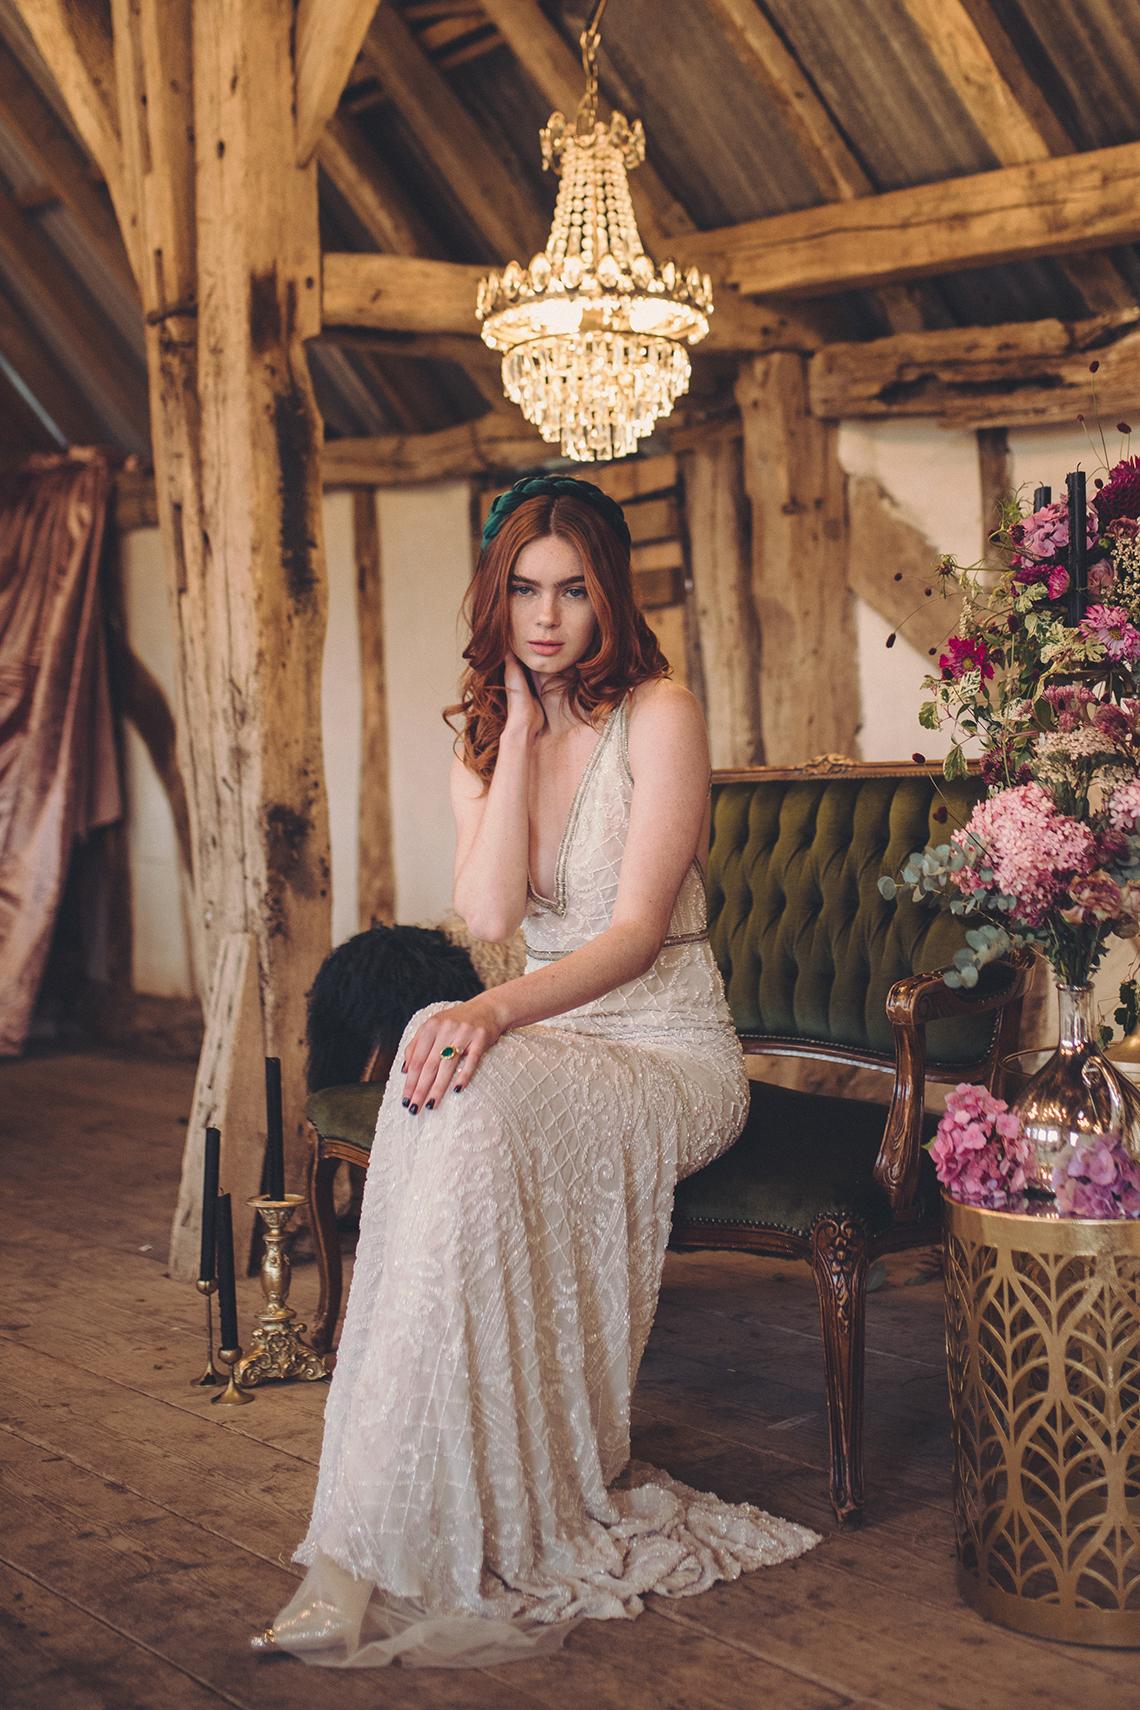 Opulent Barn Holiday Wedding Inspiration – Kerry Ann Duffy Photography 41